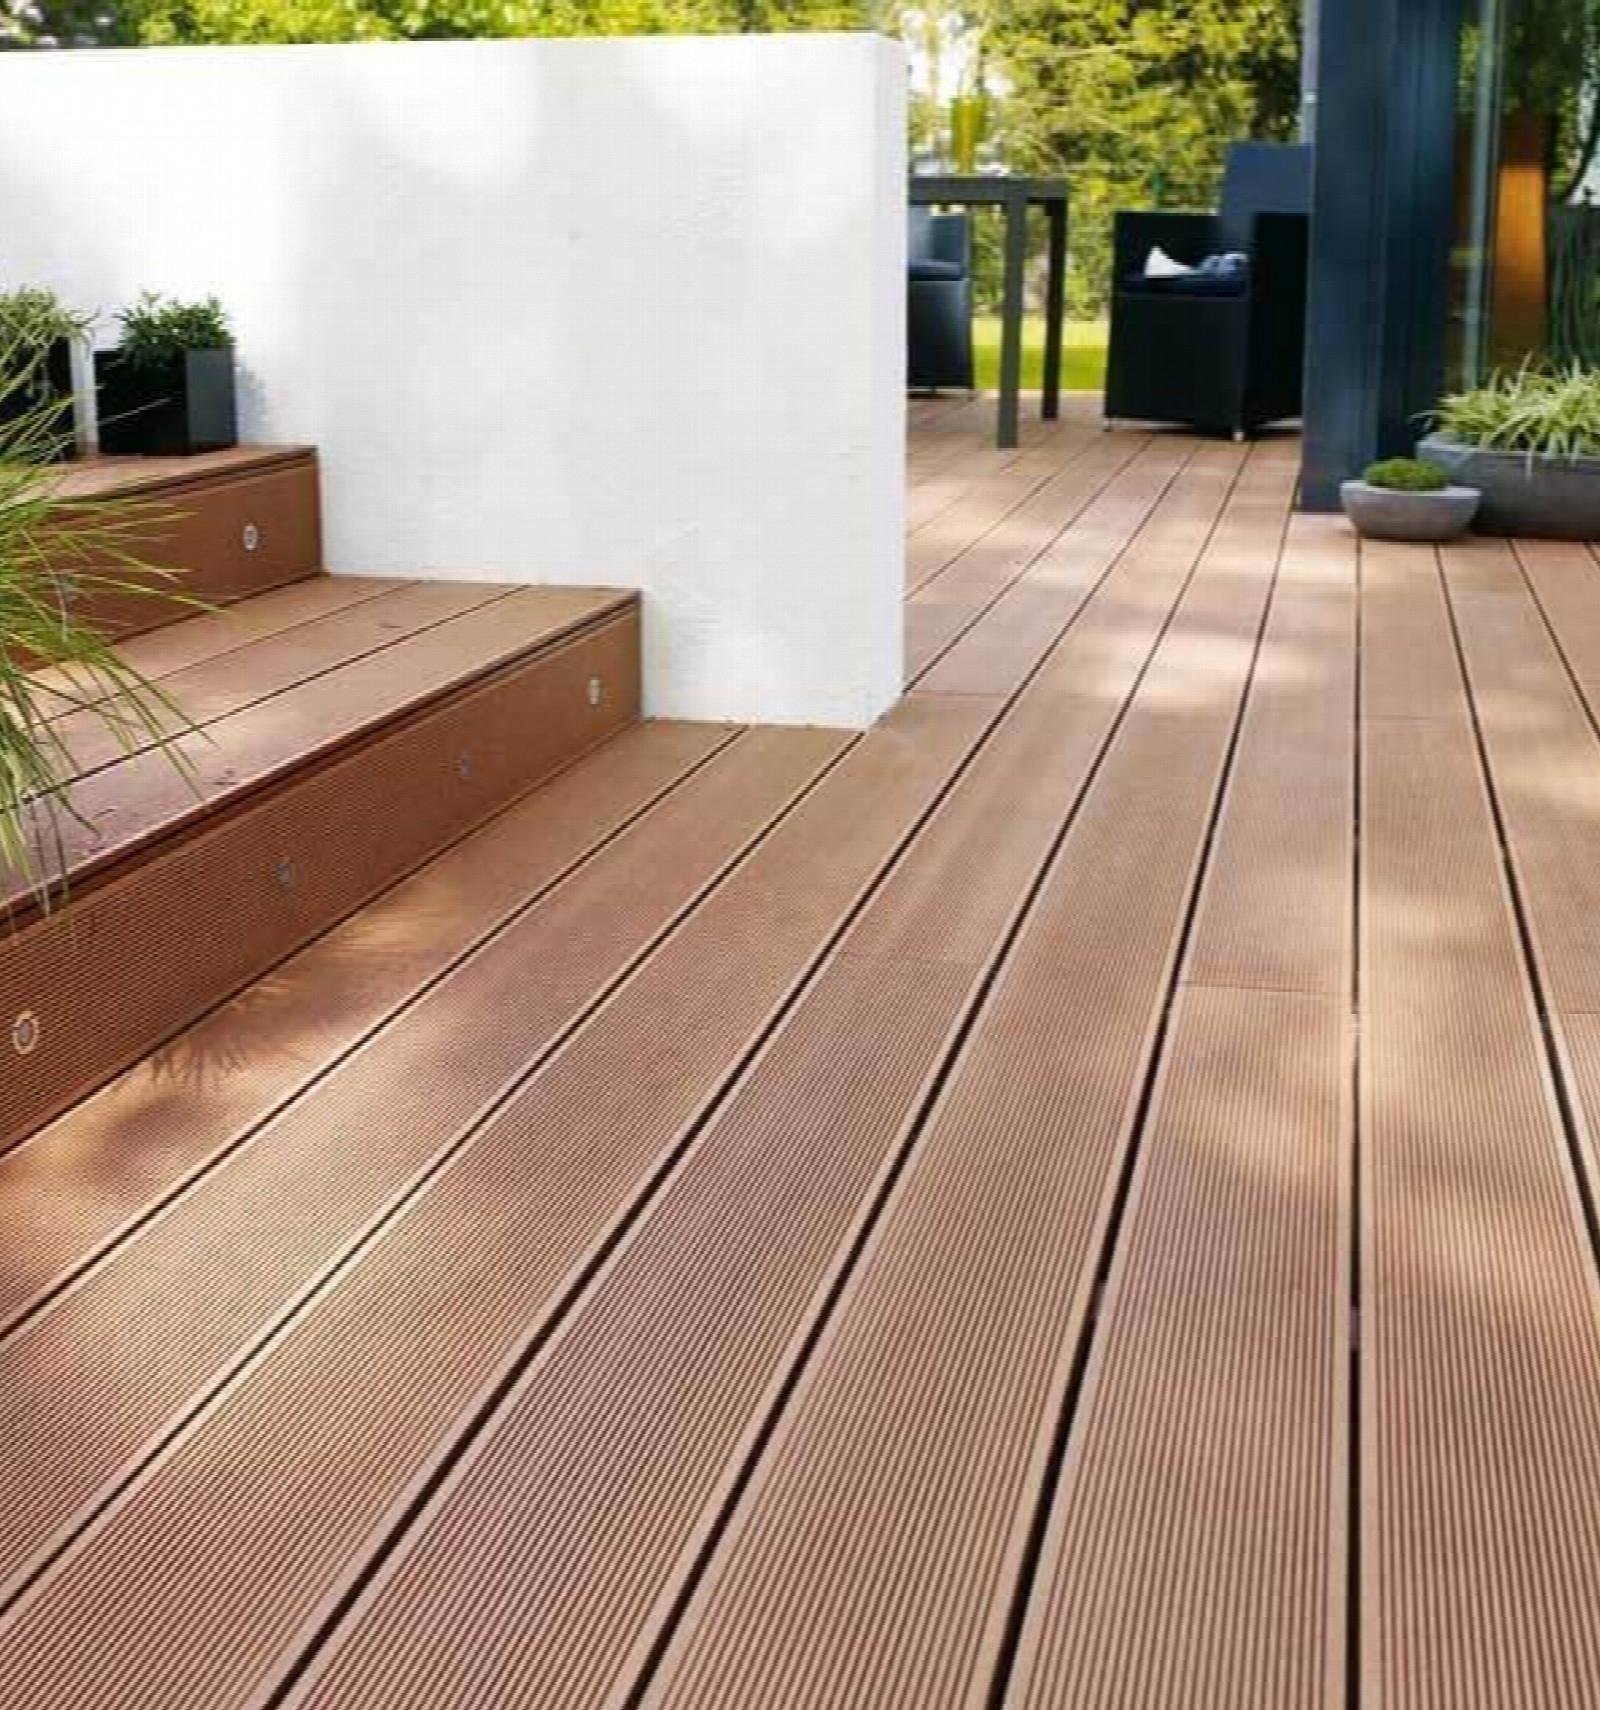 Lame De Terrasse Composite - Marron - Composite tout Destockage Lame De Terrasse Bois